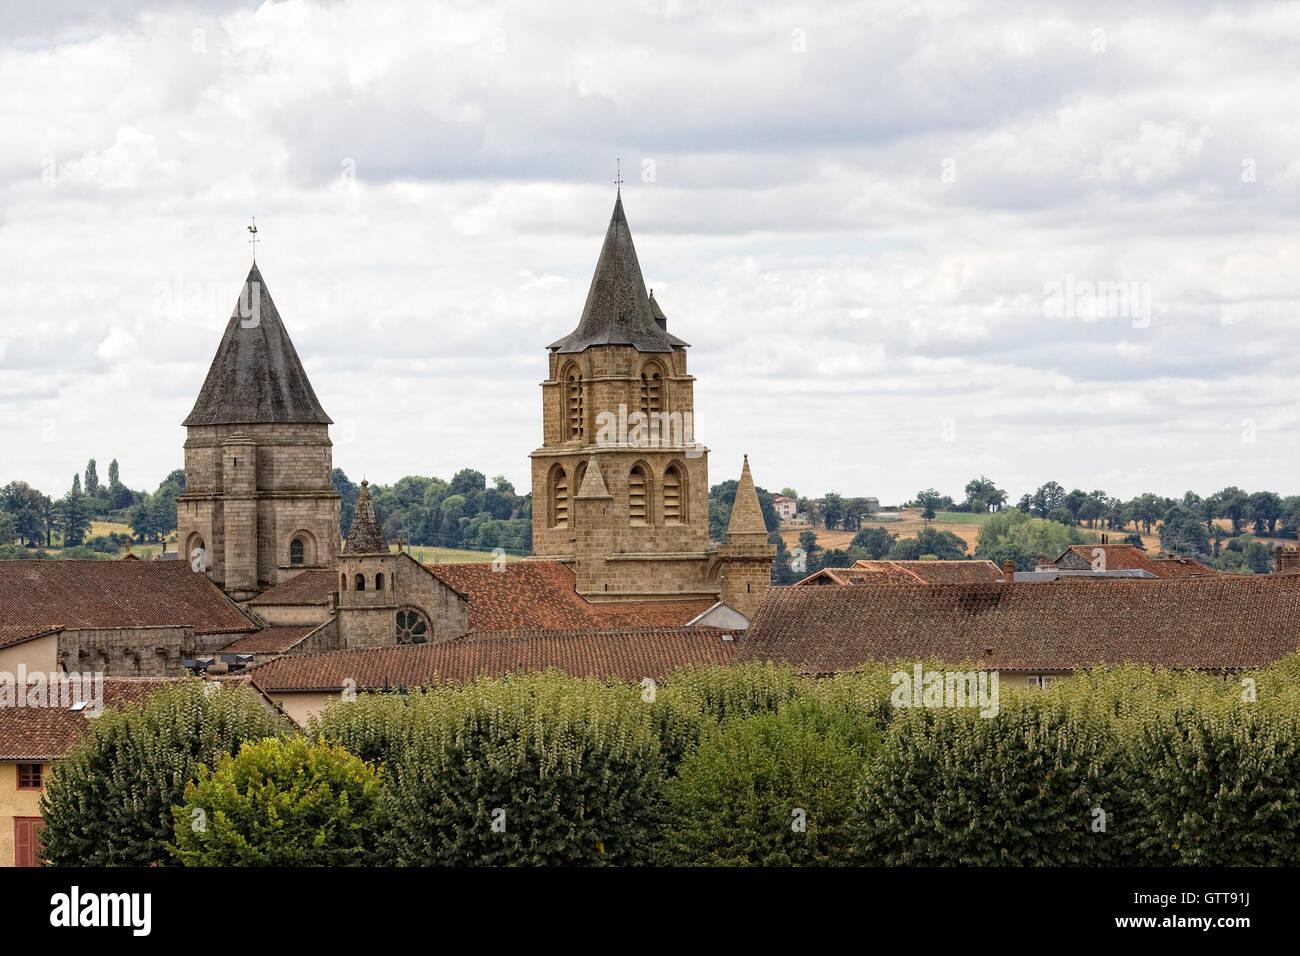 Towers of Collegiale Church of Saint-Junien, St. Junien, France. - Stock Image